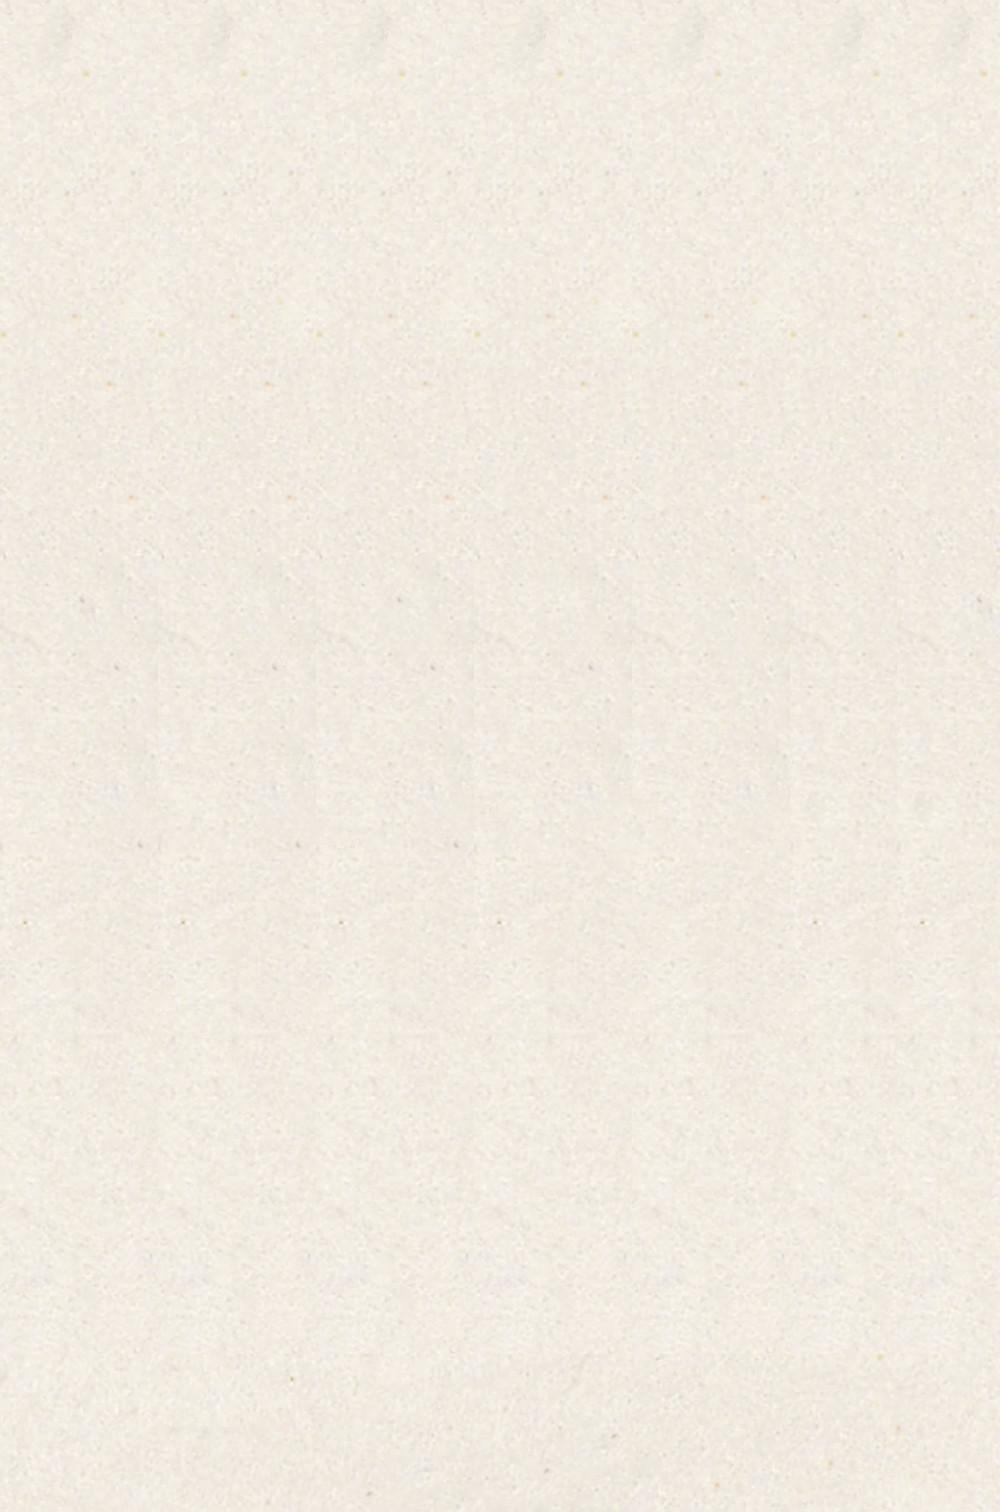 Cream Blank Page.jpg